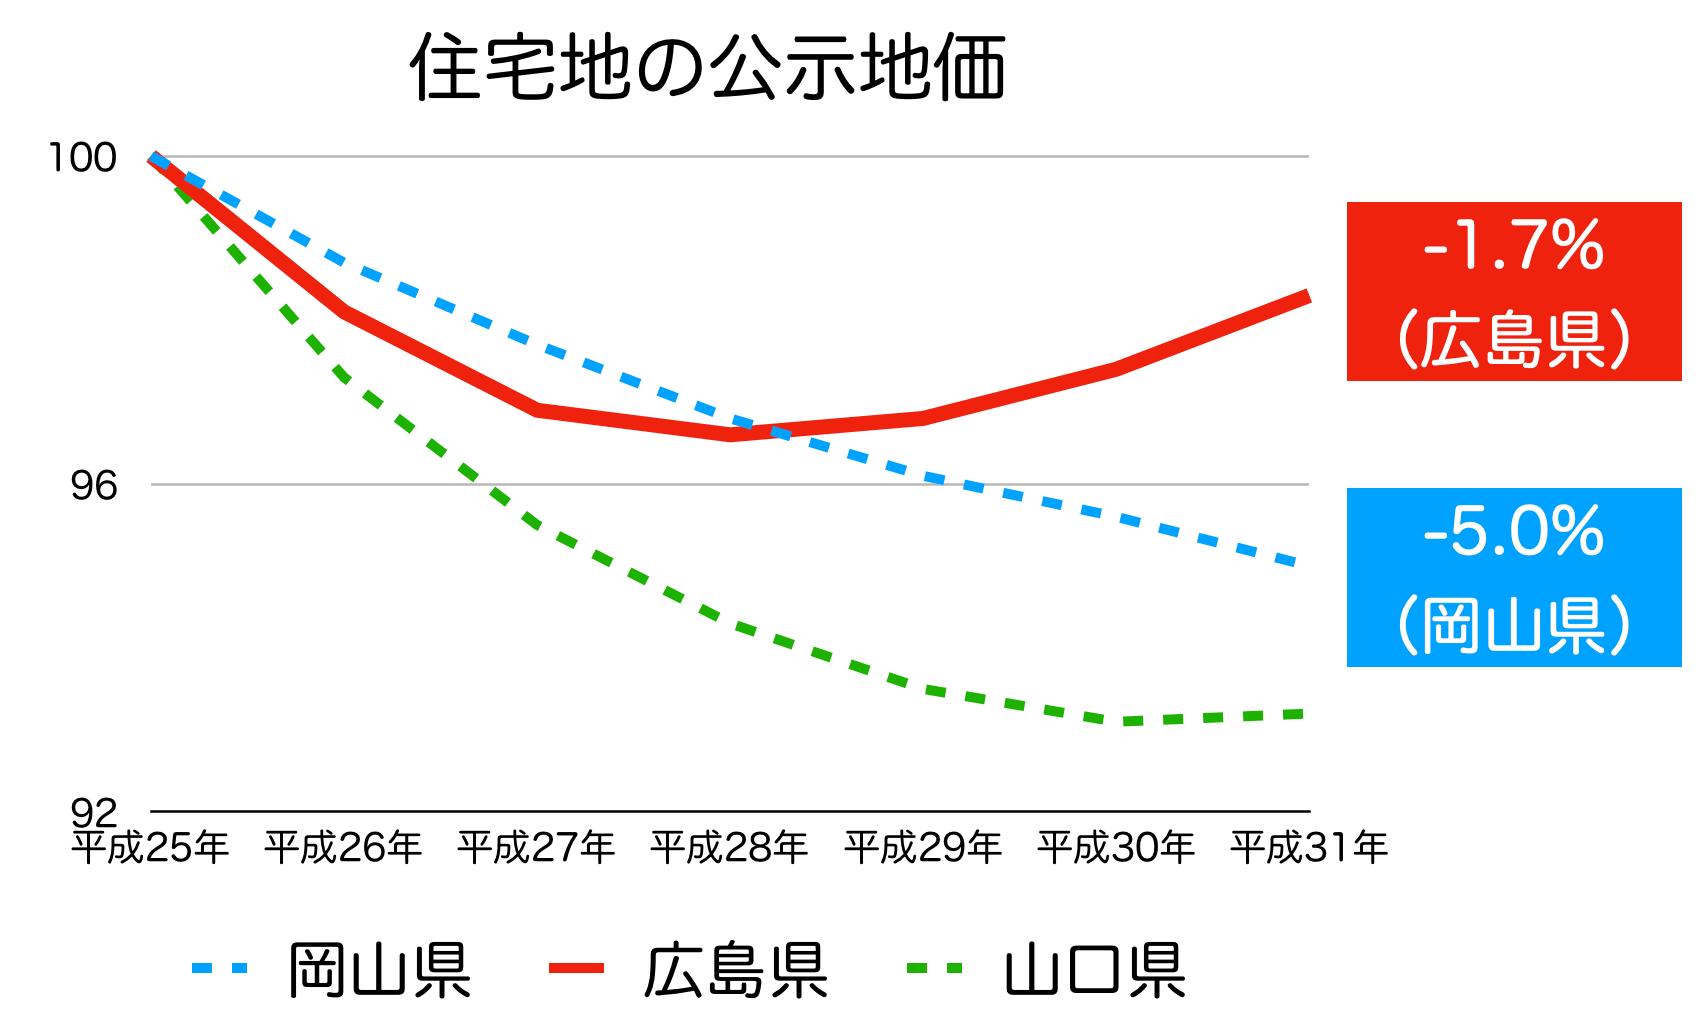 広島県の公示地価 H25-H31